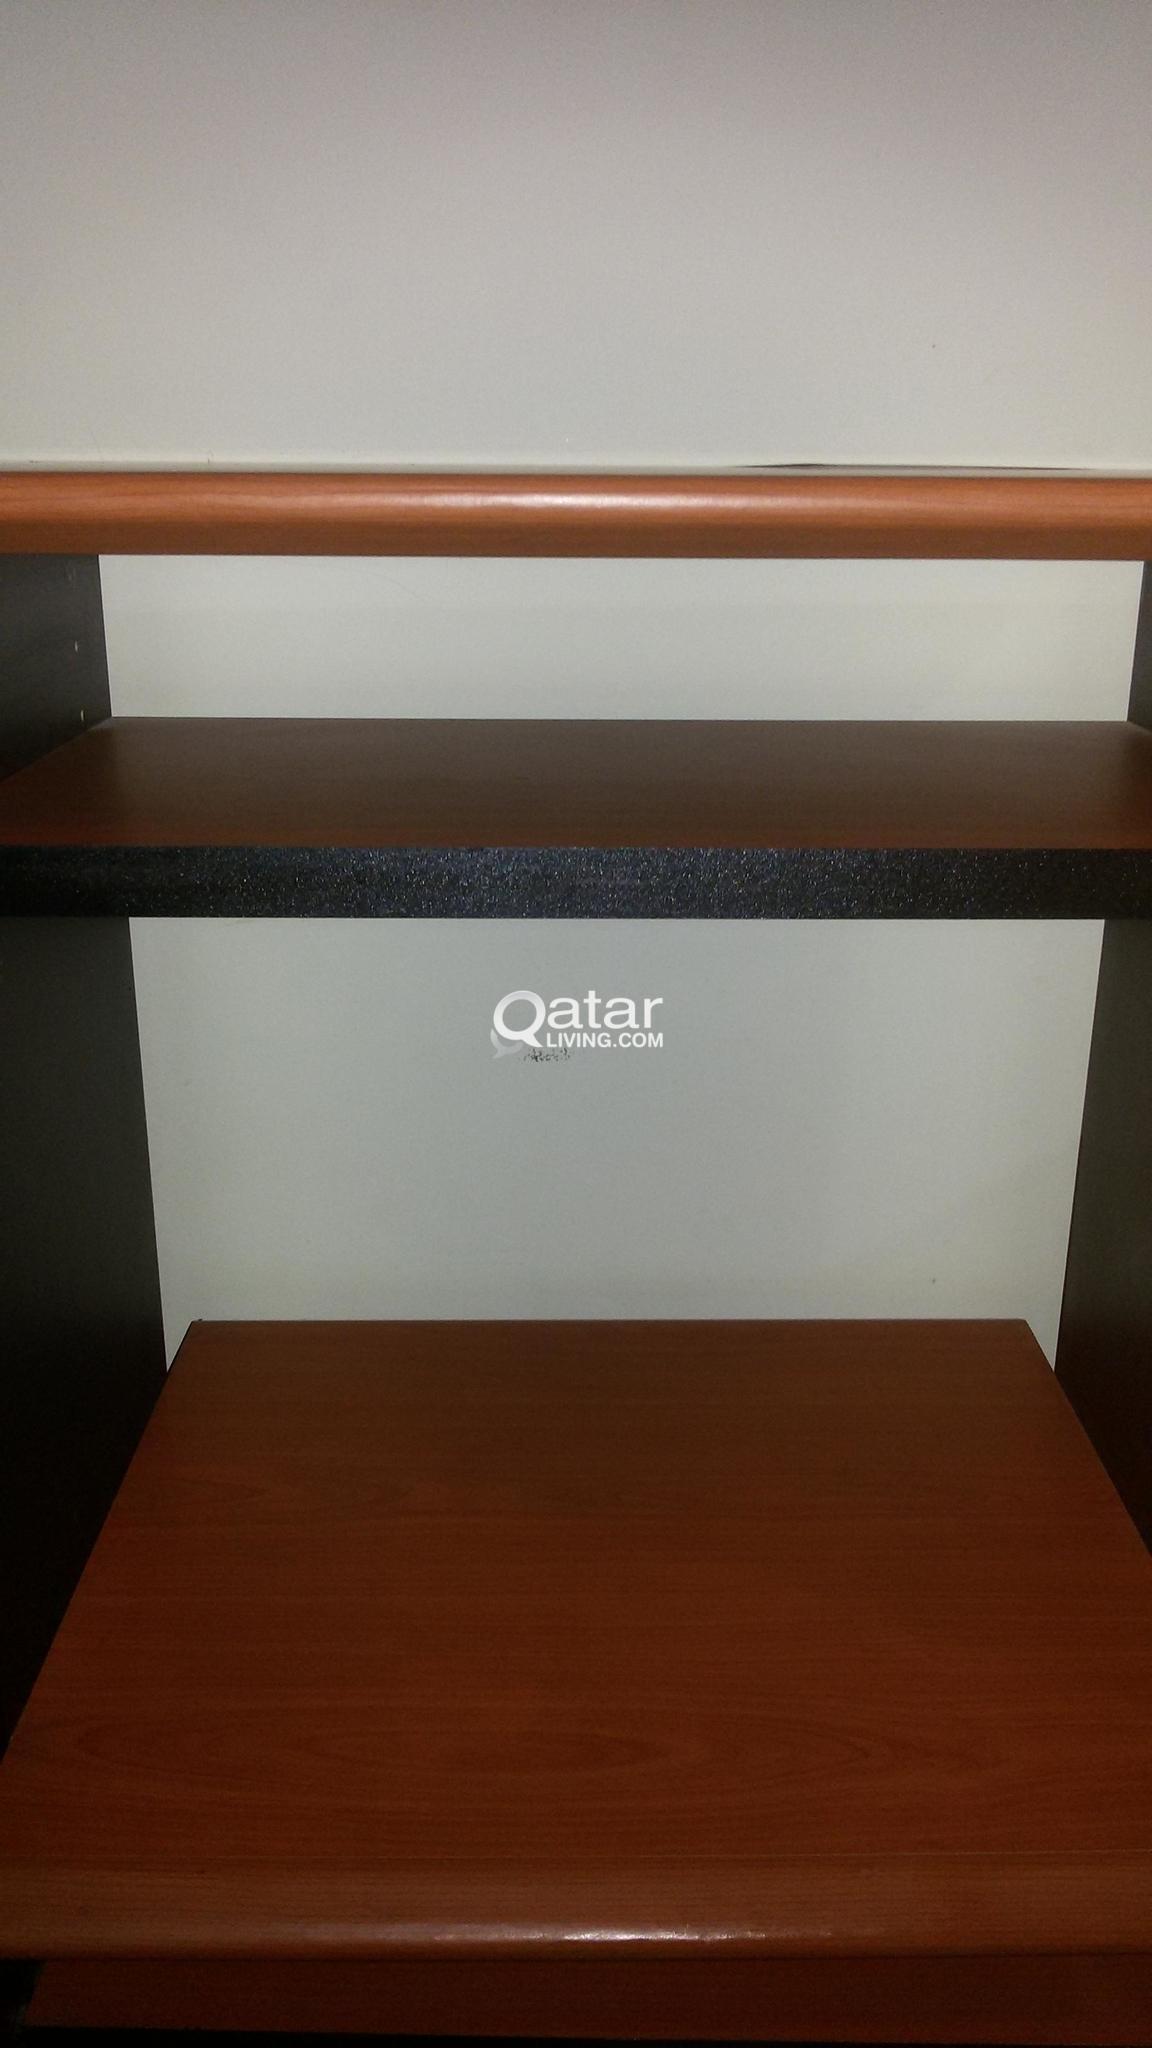 Astonishing Homes R Us Home Center Furniture For Sale Qatar Living Download Free Architecture Designs Intelgarnamadebymaigaardcom